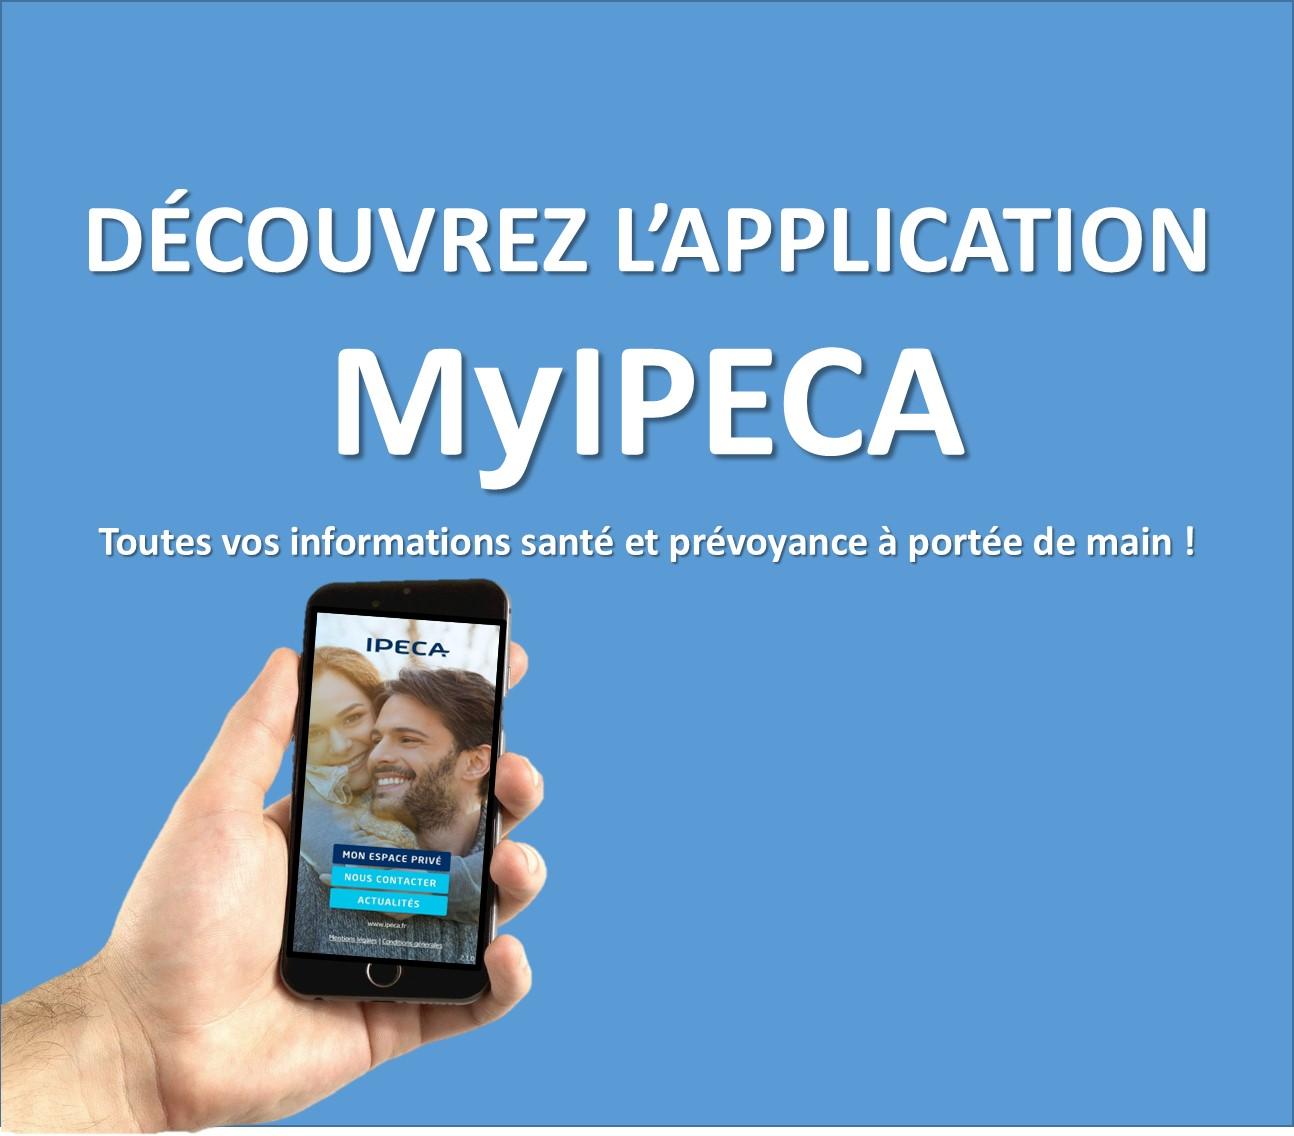 Découvrez l'application MyIPECA